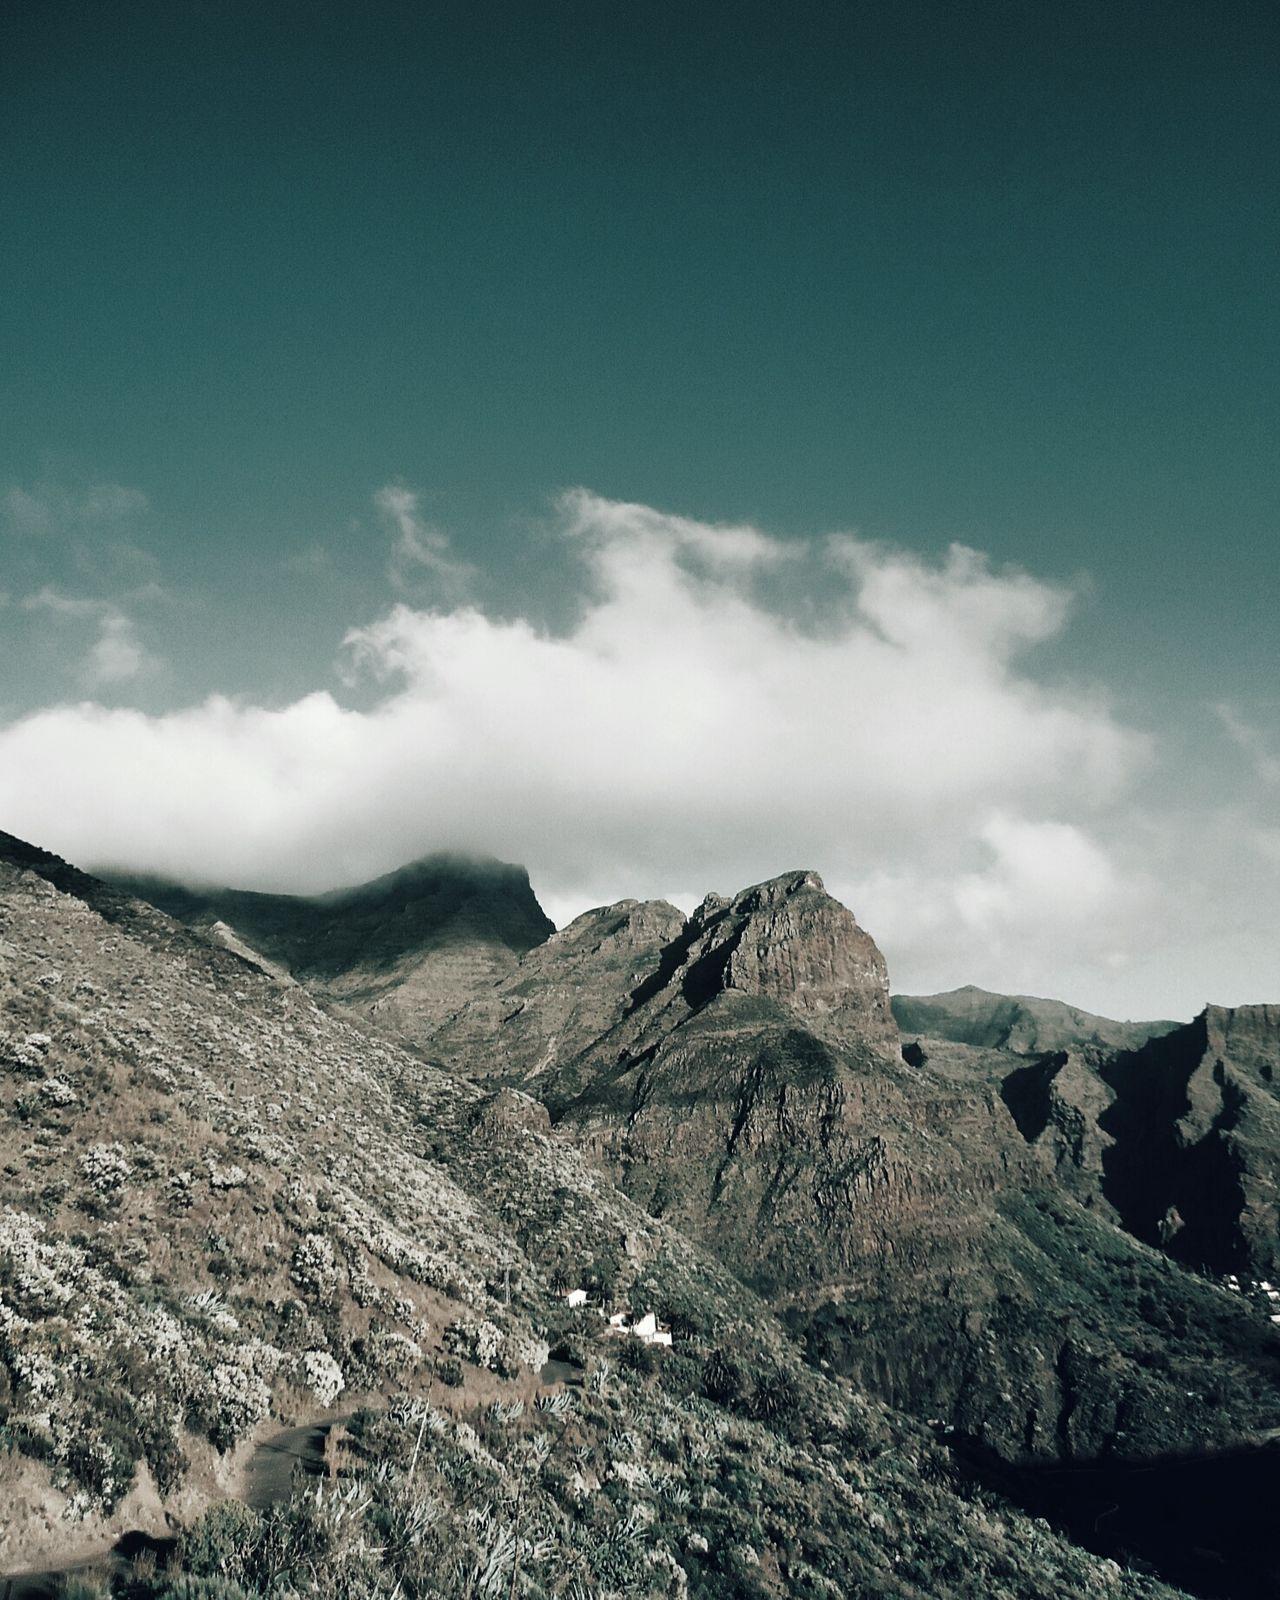 Landscape Mountain Mountain Range Beauty In Nature Cloud - Sky Nature Dramatic Sky Volcano Teneriffa Volcanoes Islands Island Life Canary Islands